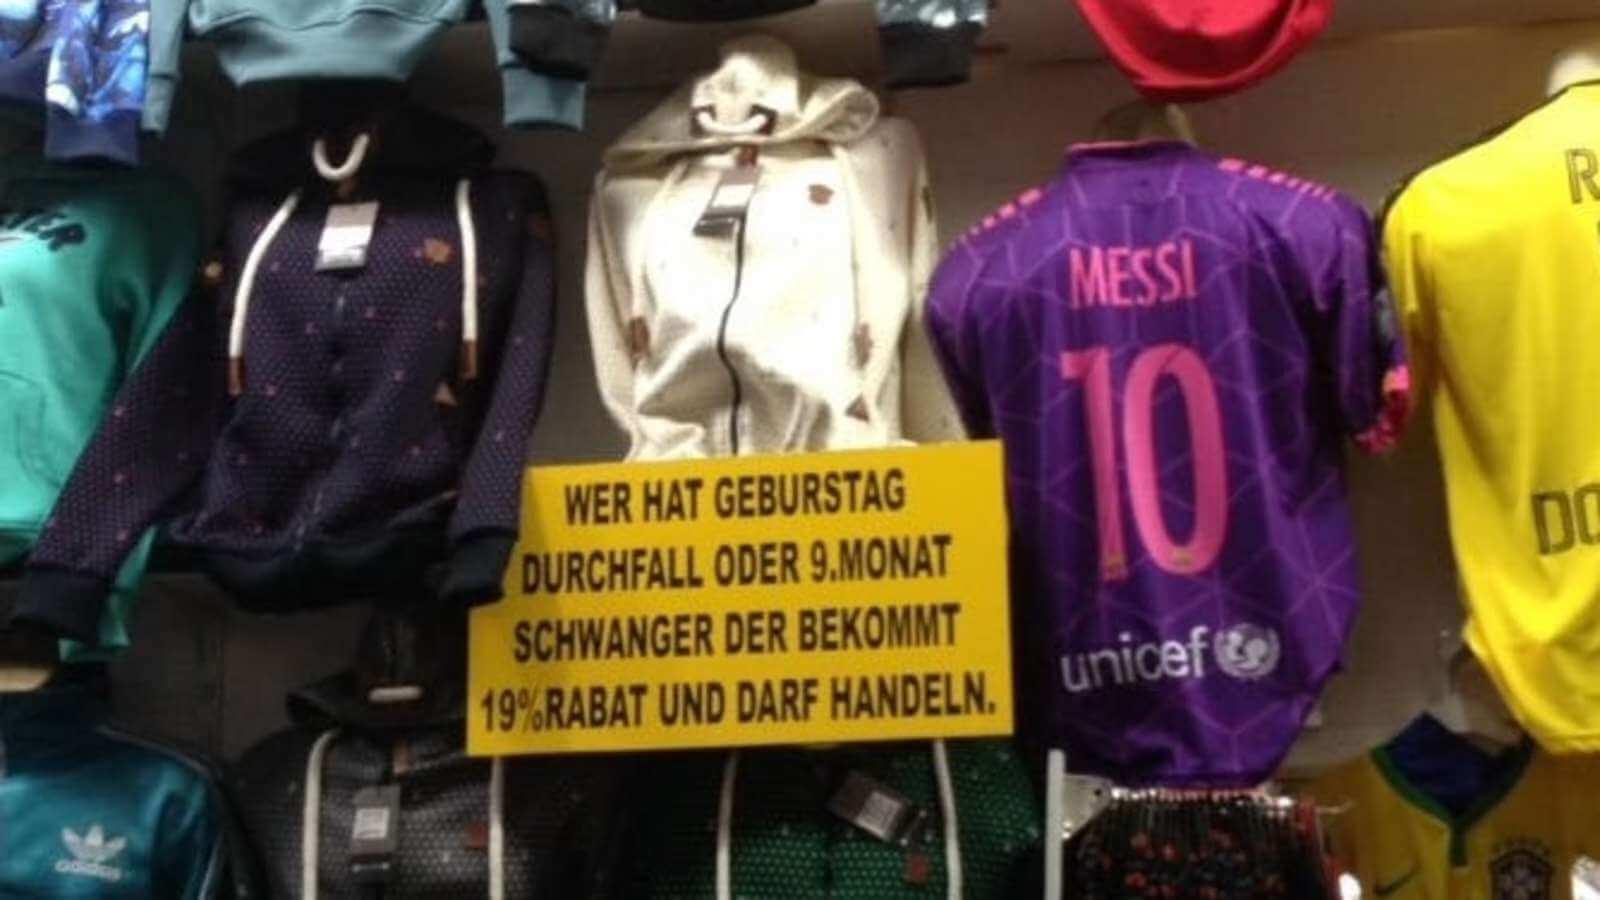 Bilderparade DCLXIV LangweileDich.net_Bilderparade_DCLXIV_07